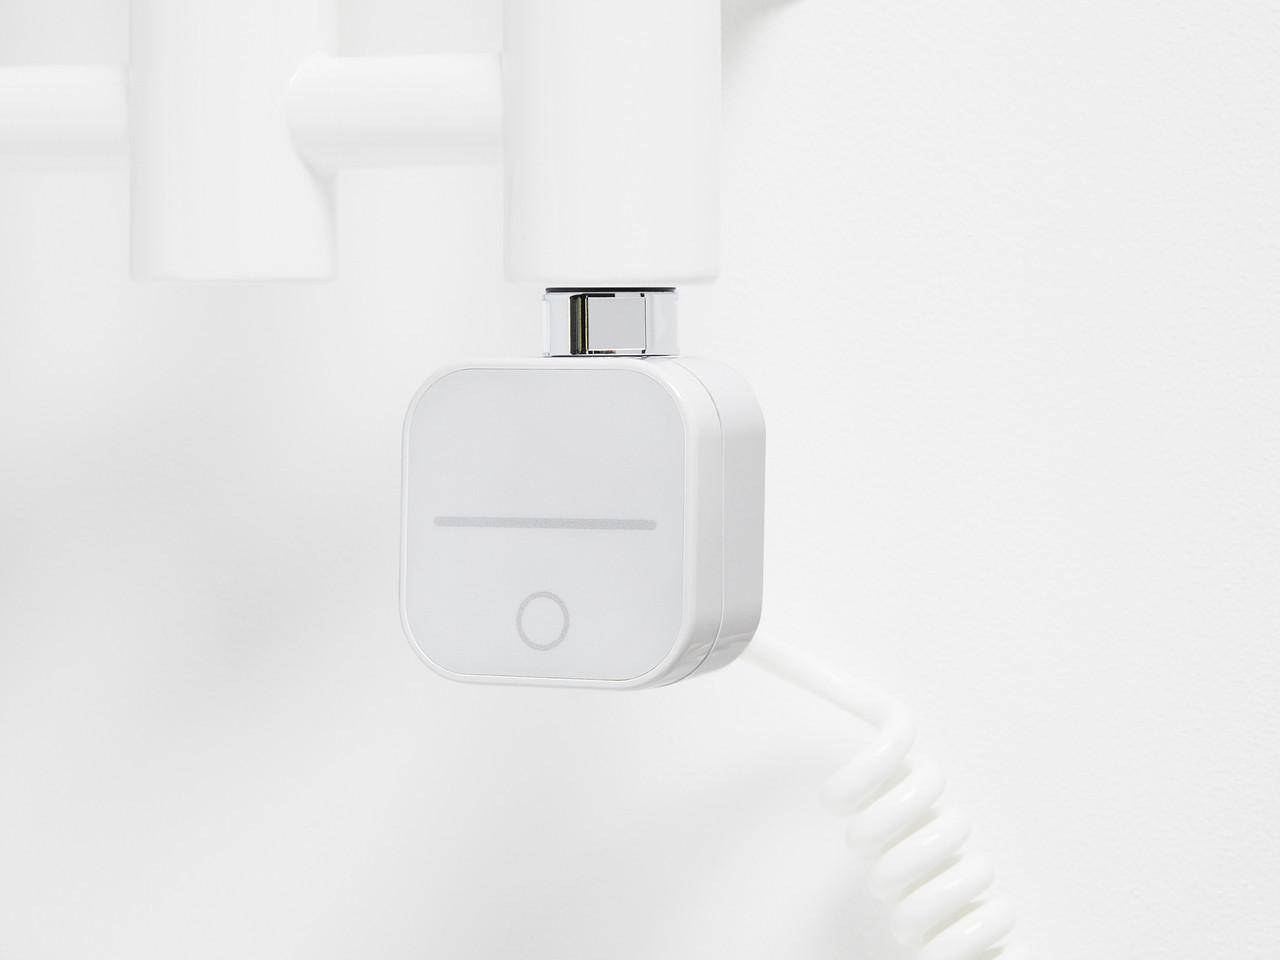 ТЭН HeatQ NEX 1.0 white: регулятор 30-60С +таймер до 8ч.+ Bluetooth + программатор до 7 дней через телефон